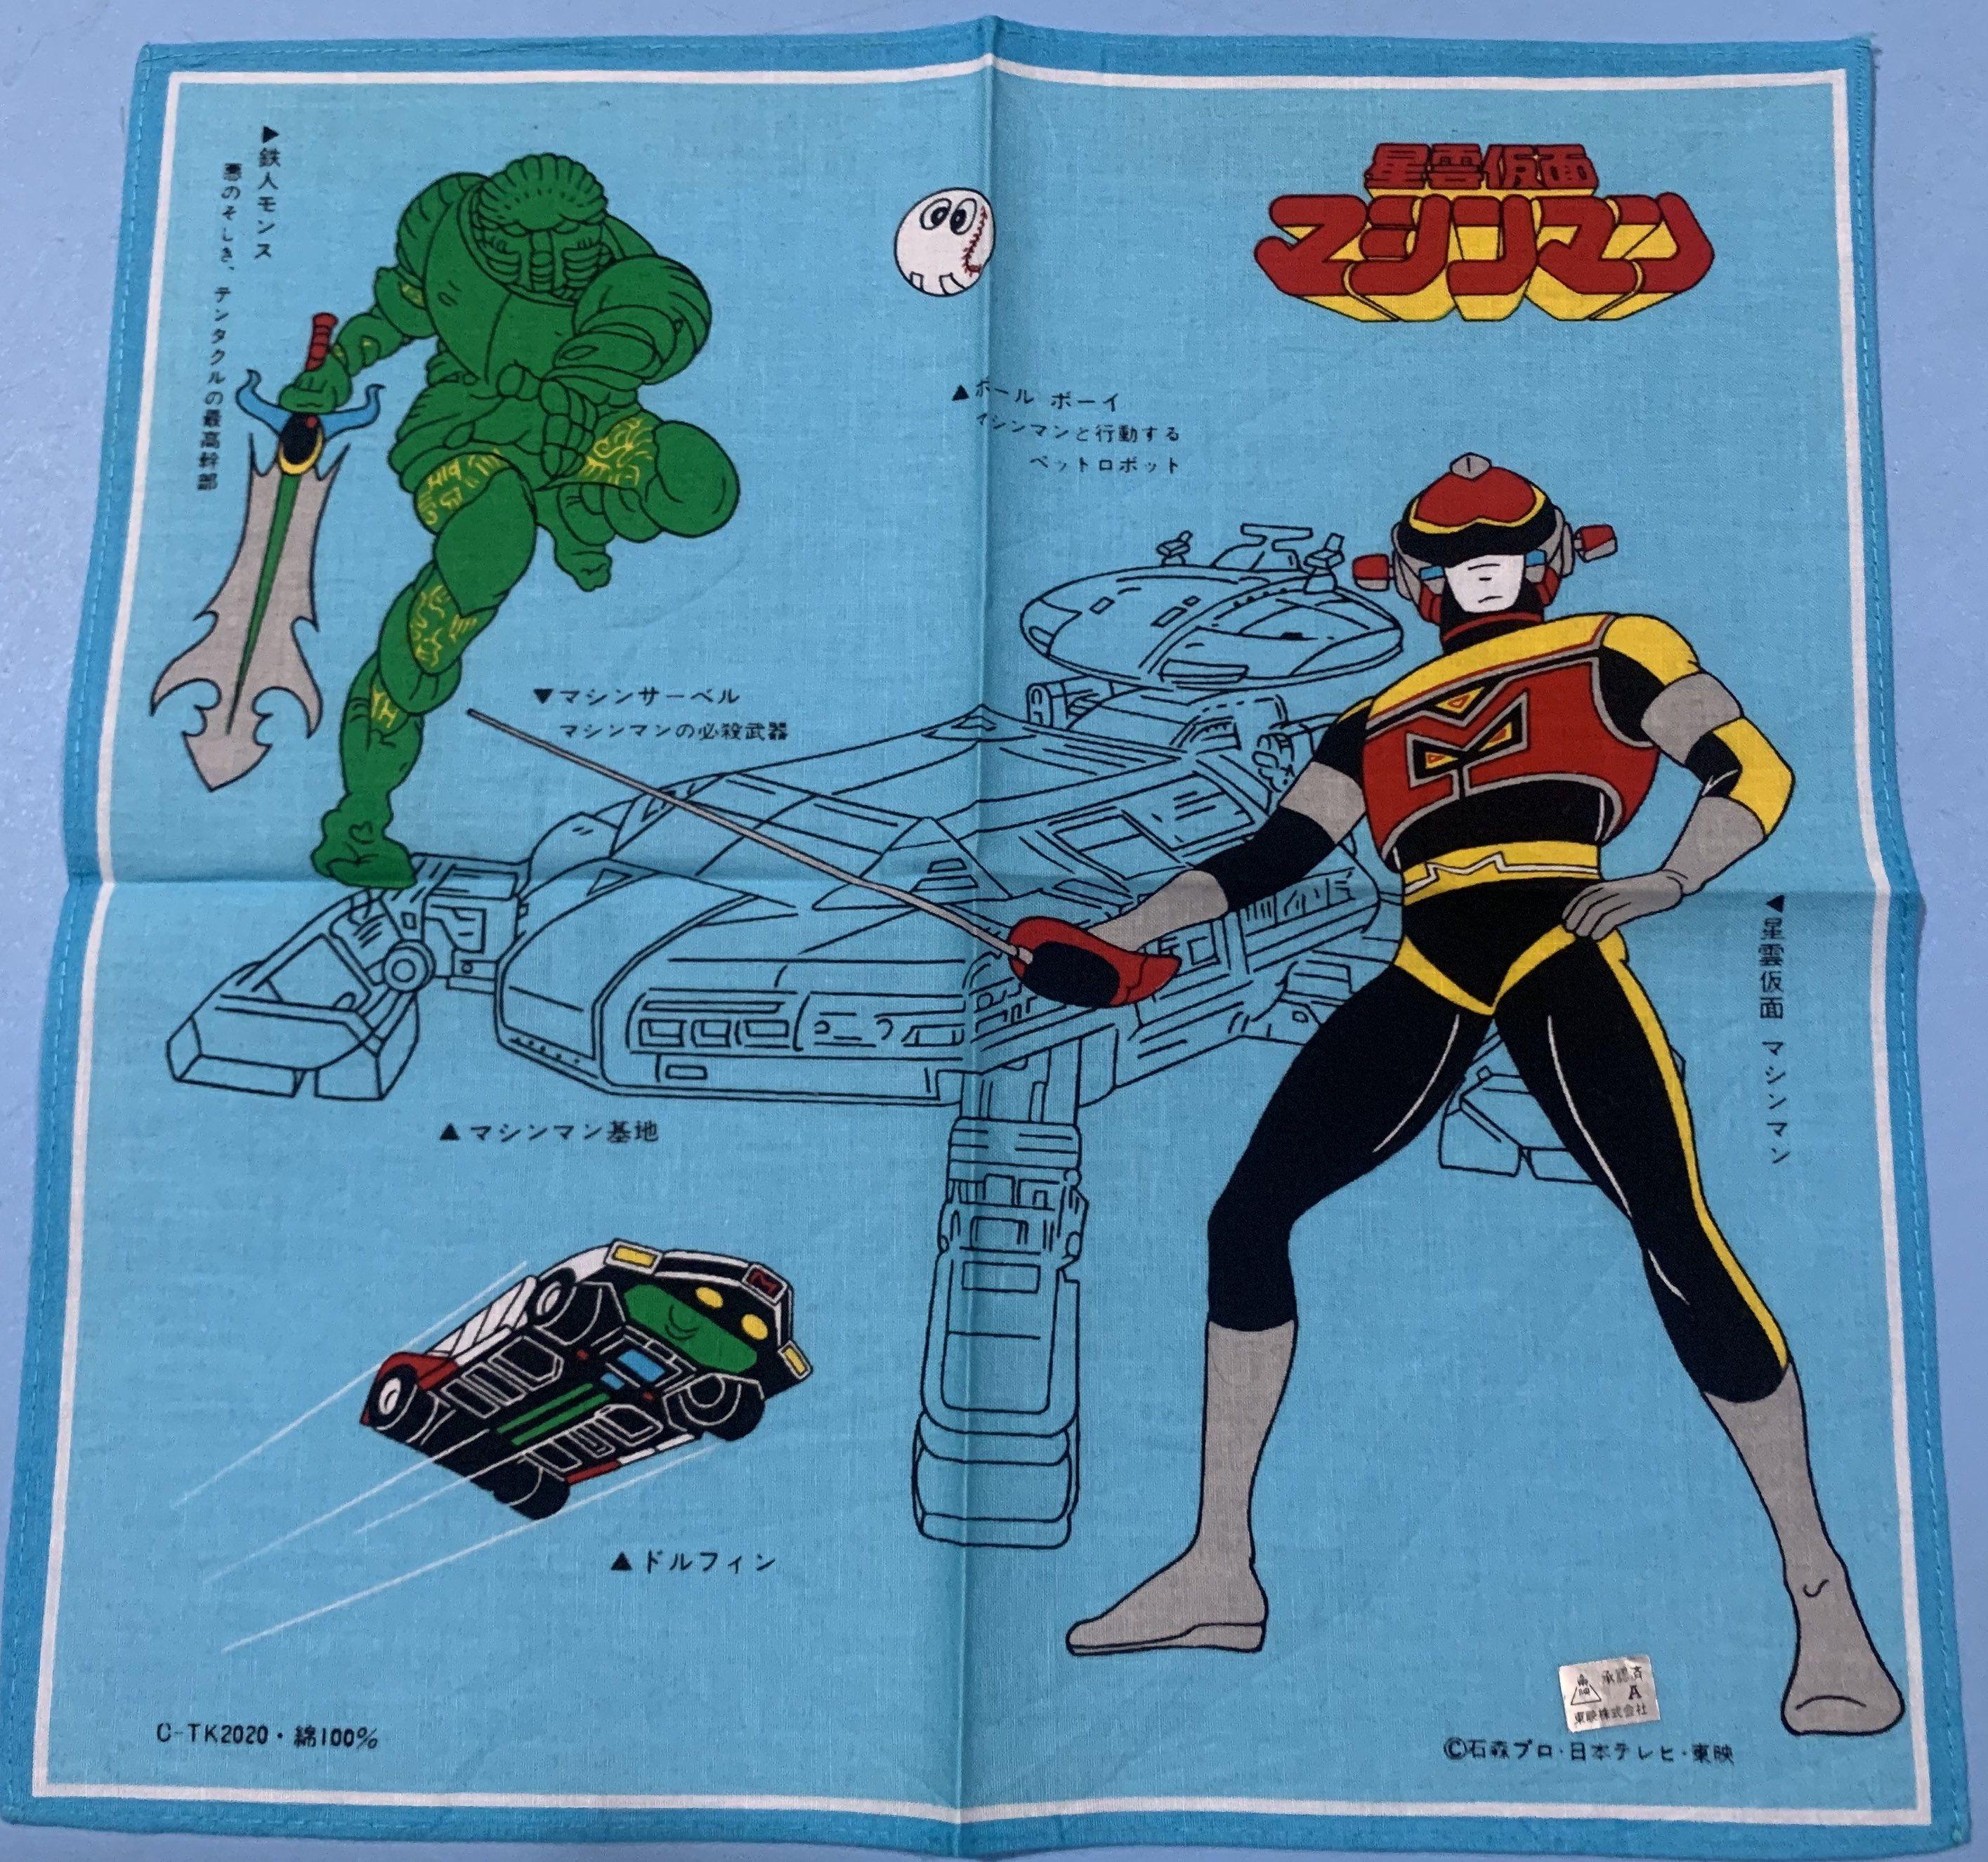 vintage child s handkerchief 1984 nebula mask machineman etsy heroes tv series hero tv vintage children